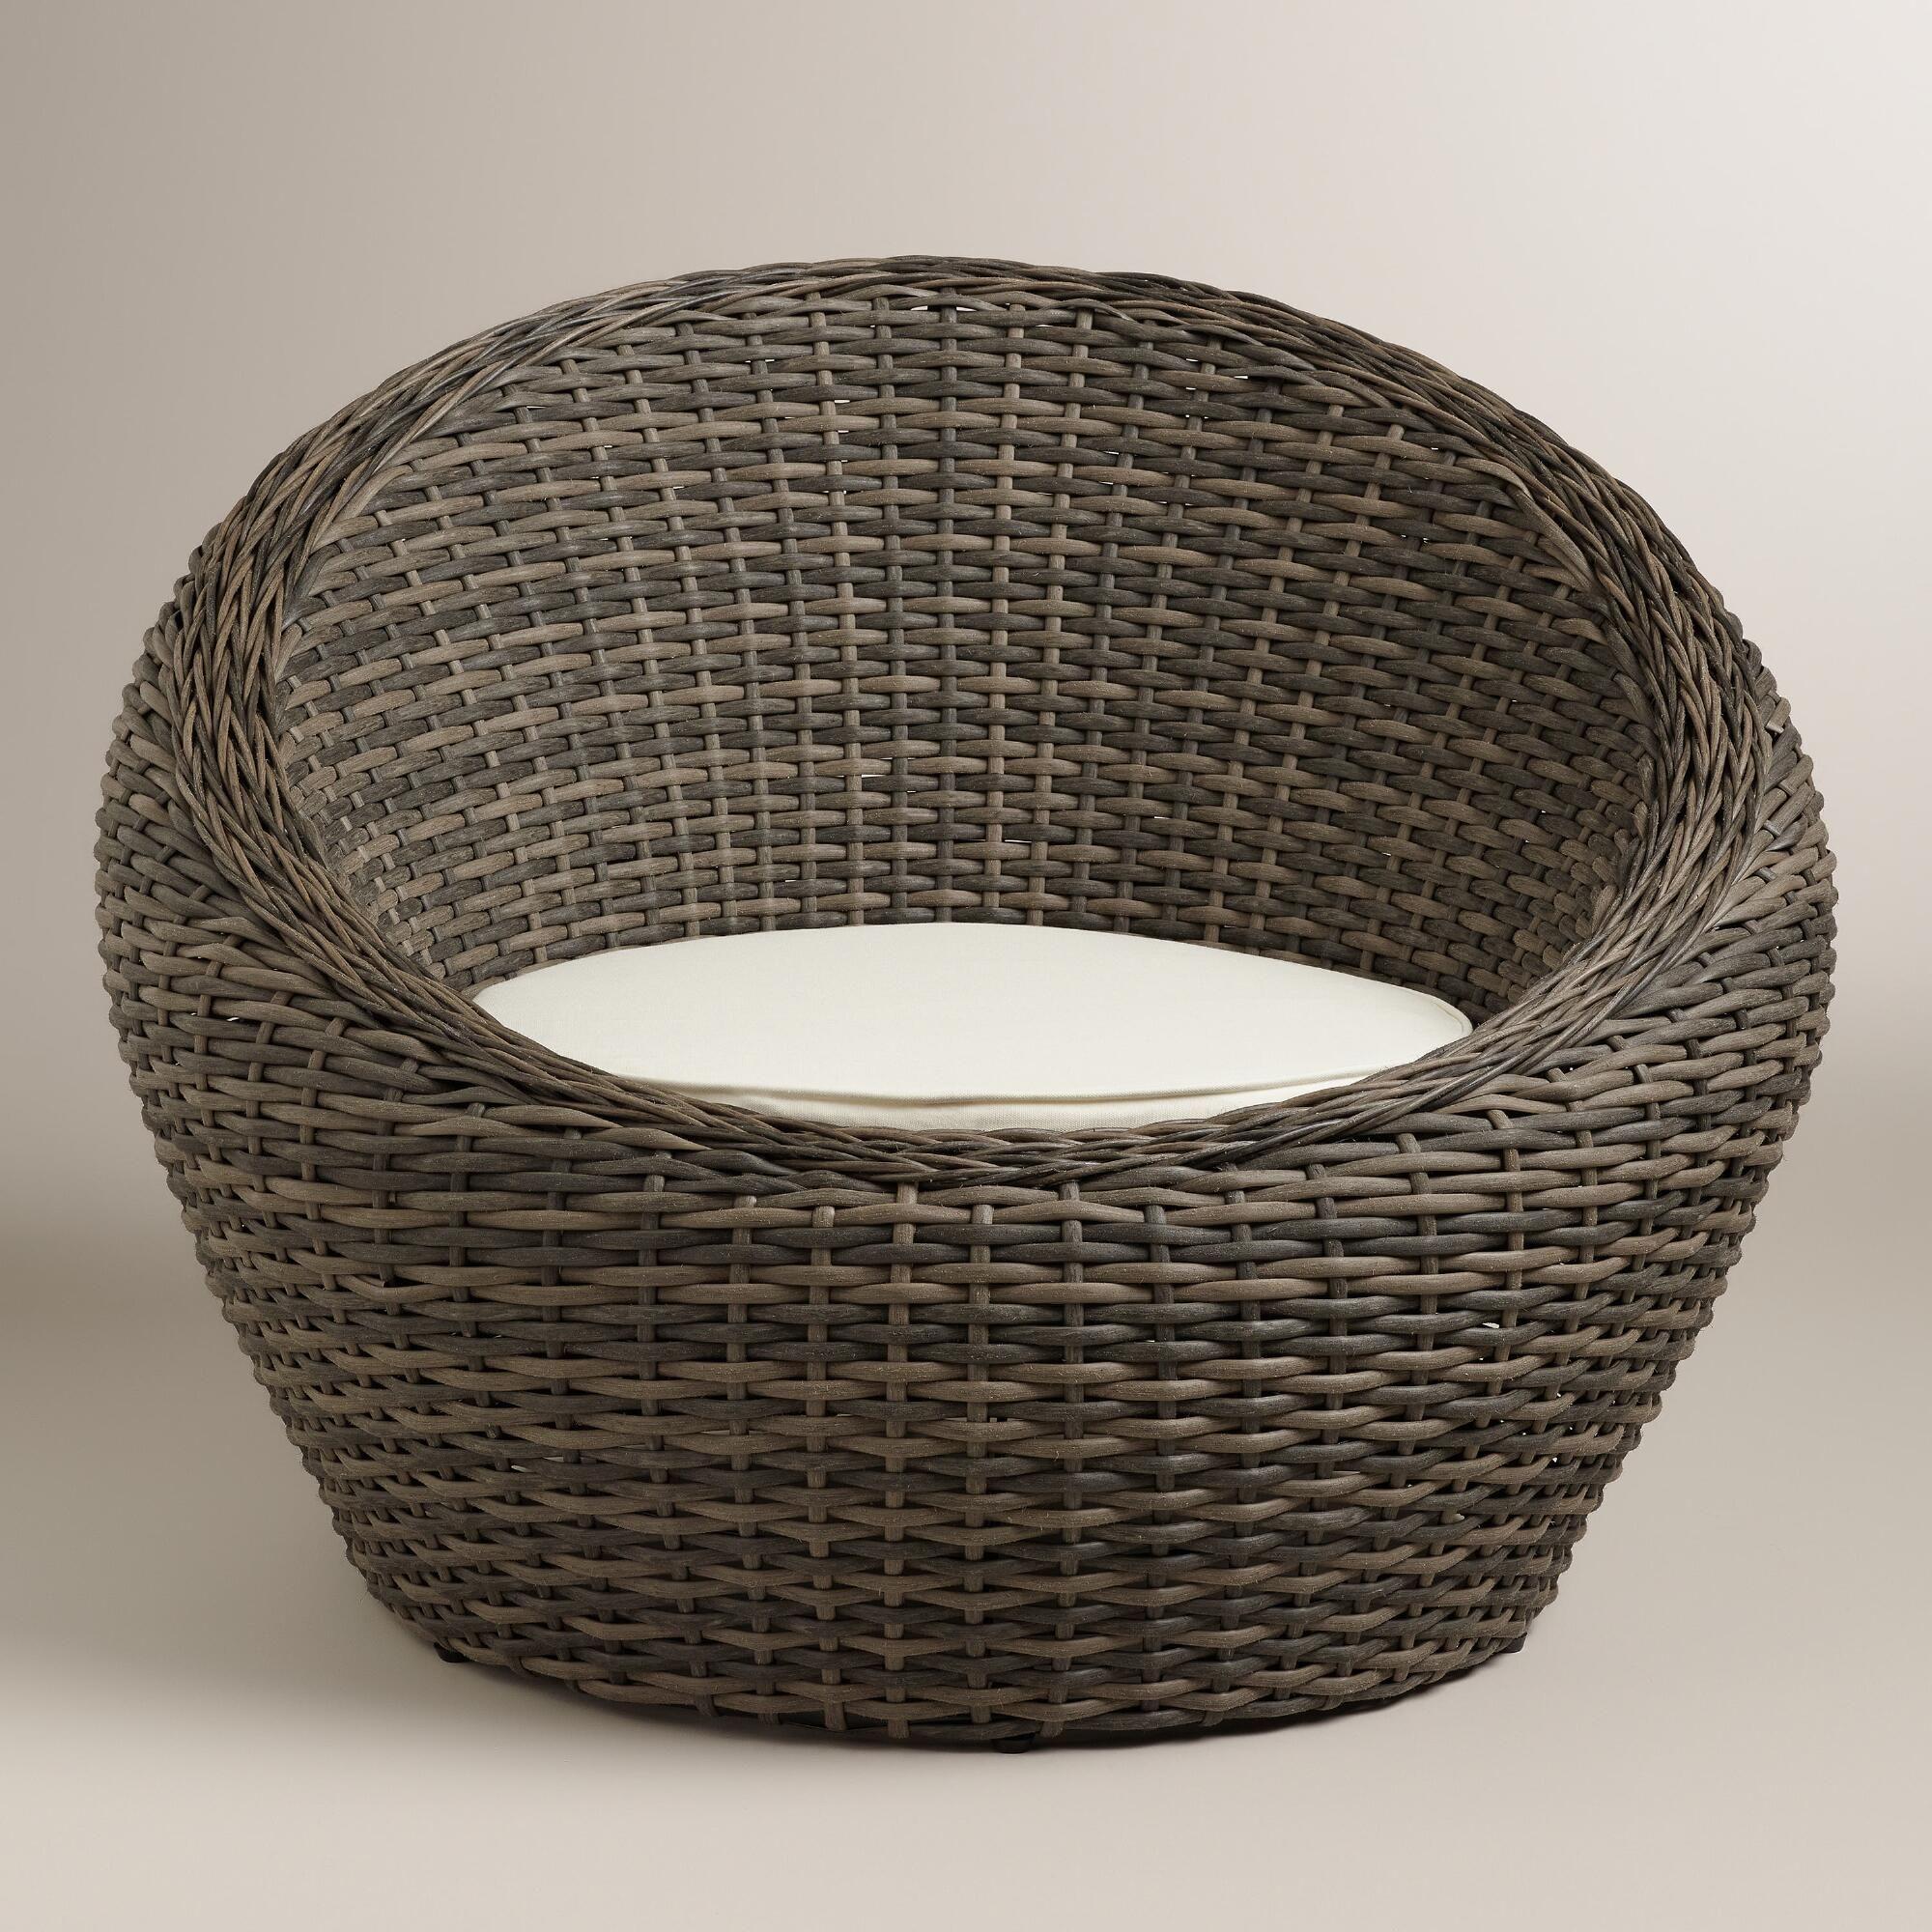 round wicker chairs outdoor